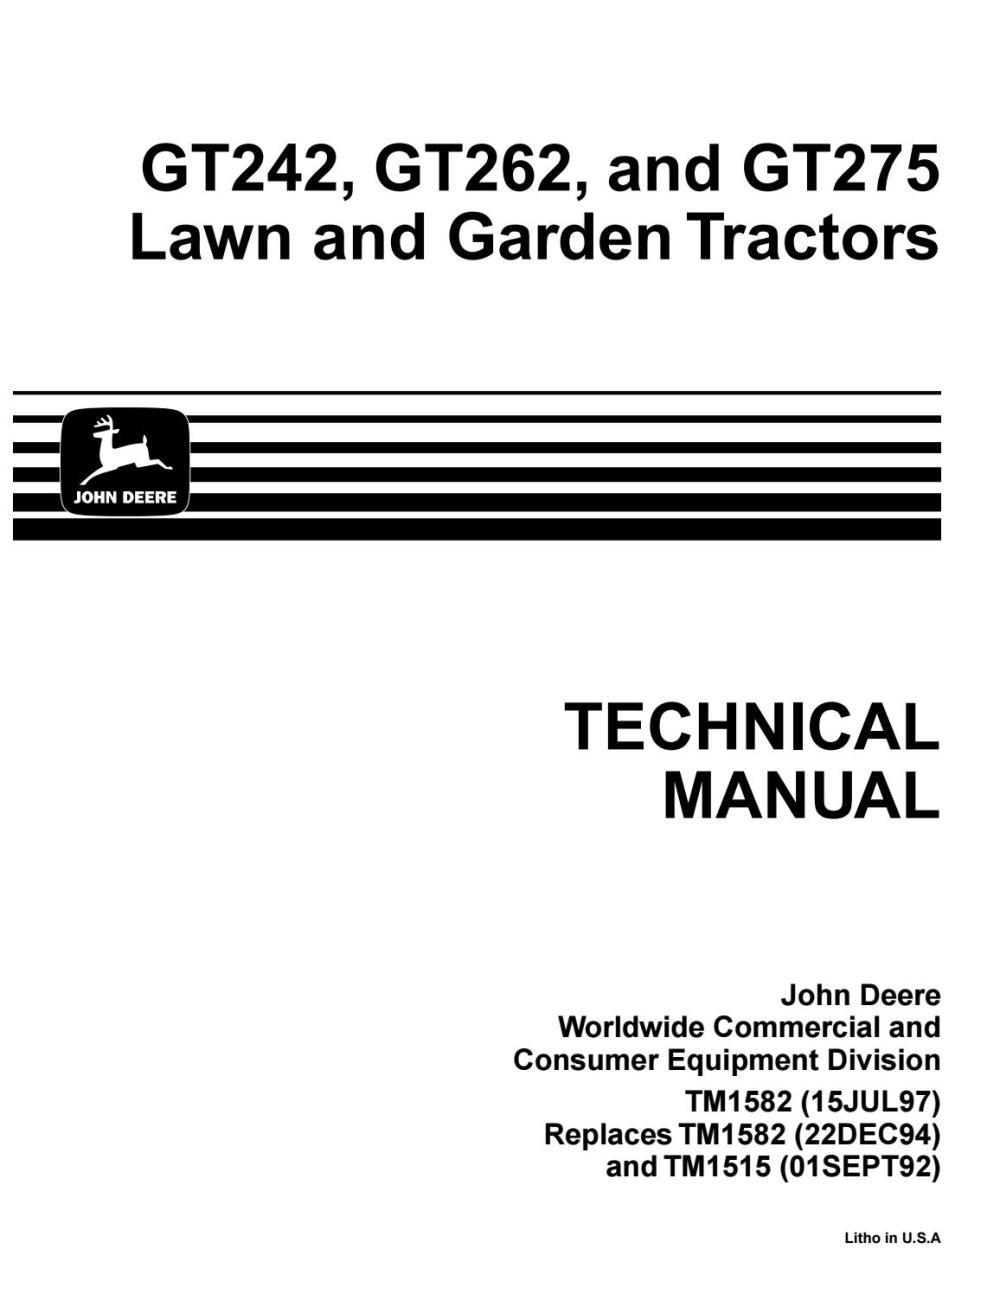 medium resolution of john deere gt275 lawn garden tractor service repair manual by ujfjisefjj issuu